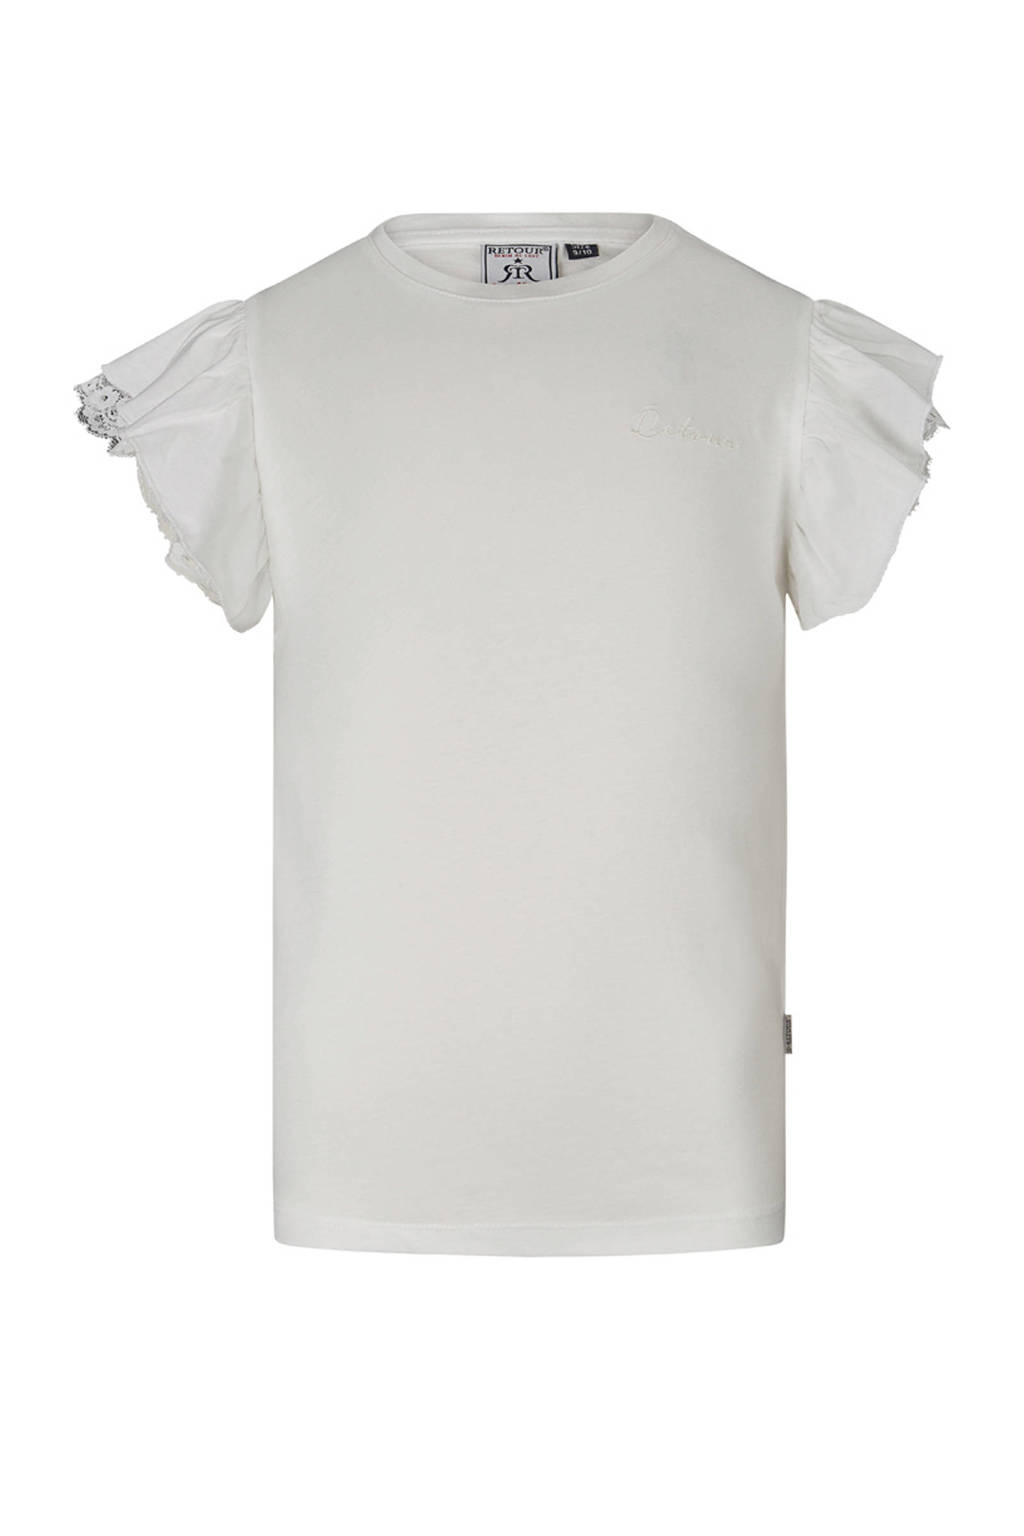 Retour Denim T-shirt Hanna met borduursels ecru, Ecru